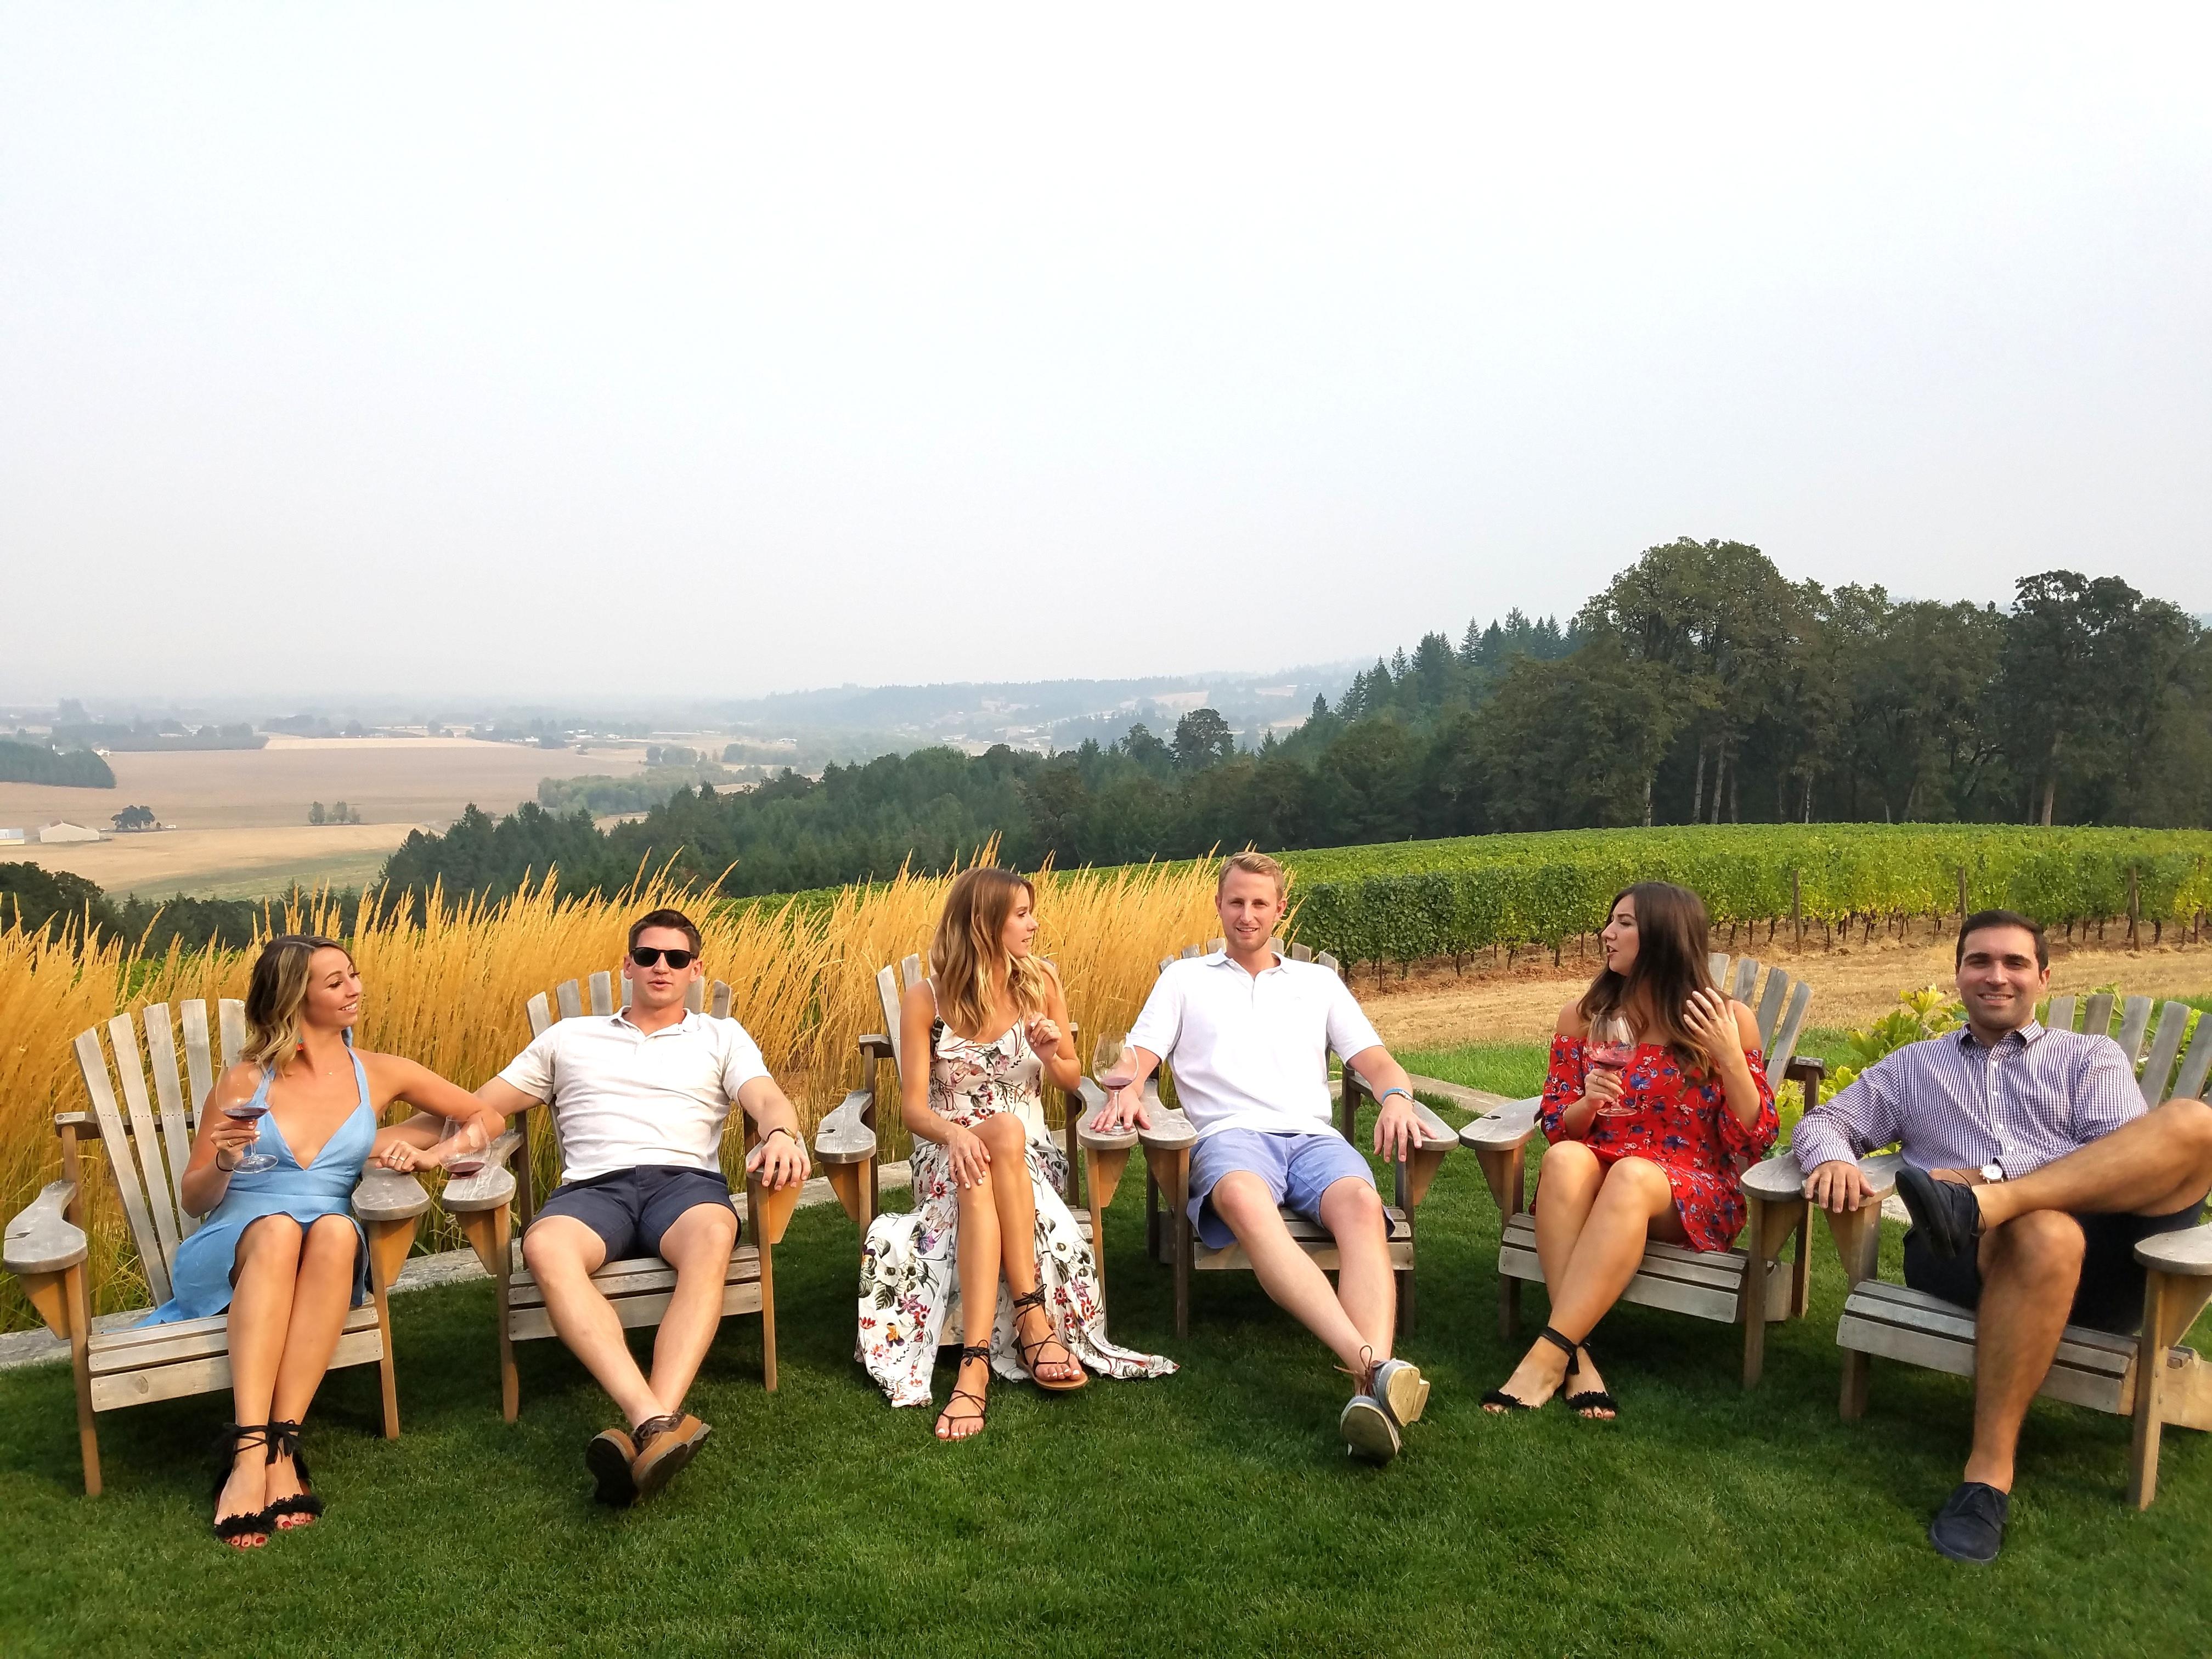 Willamette Valley Tour-Portland and Oregon Wine Tours   3606 SE Steele St, Portland, OR, 97202   +1 (503) 558-4600